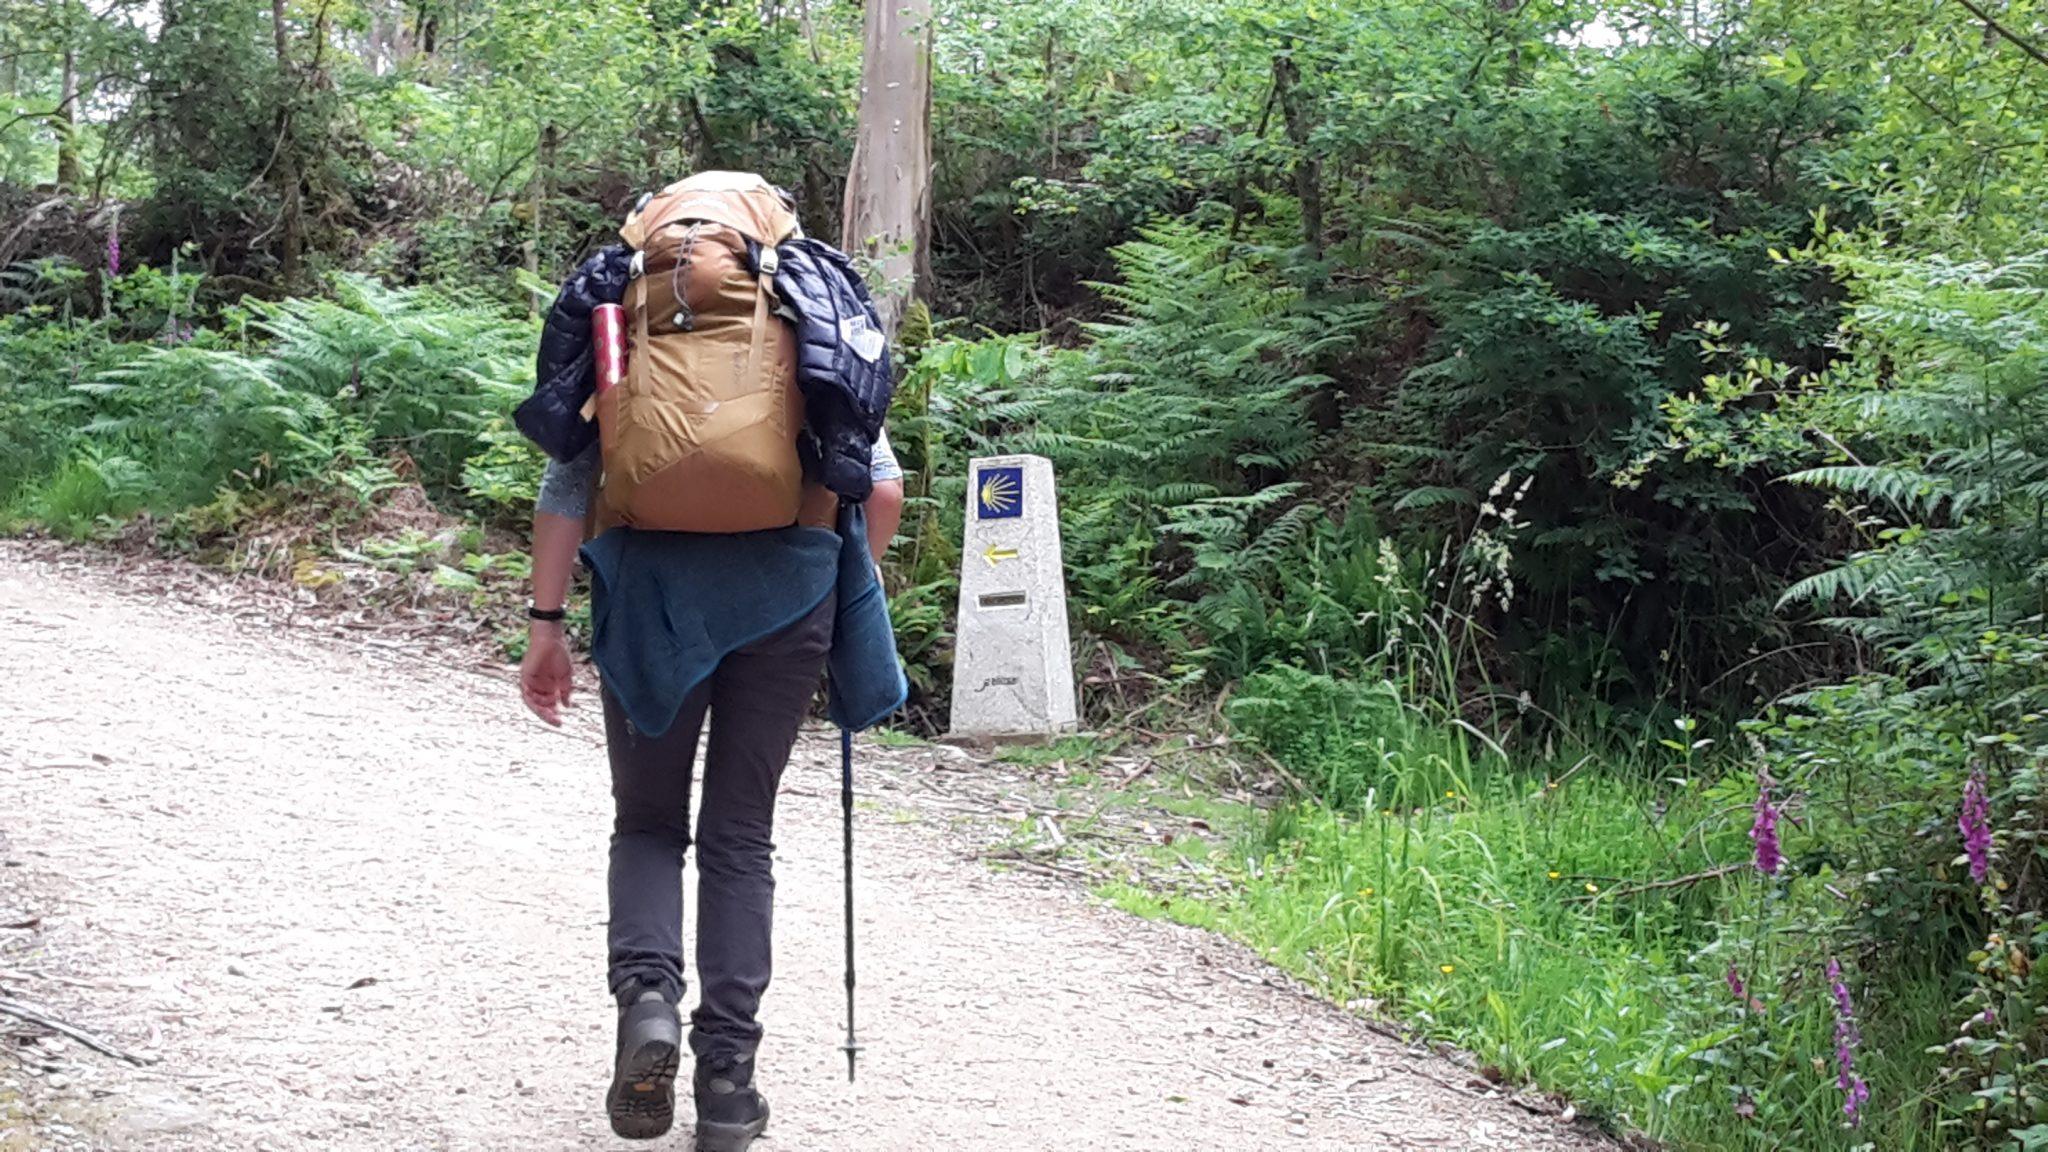 Camino de Fisterra